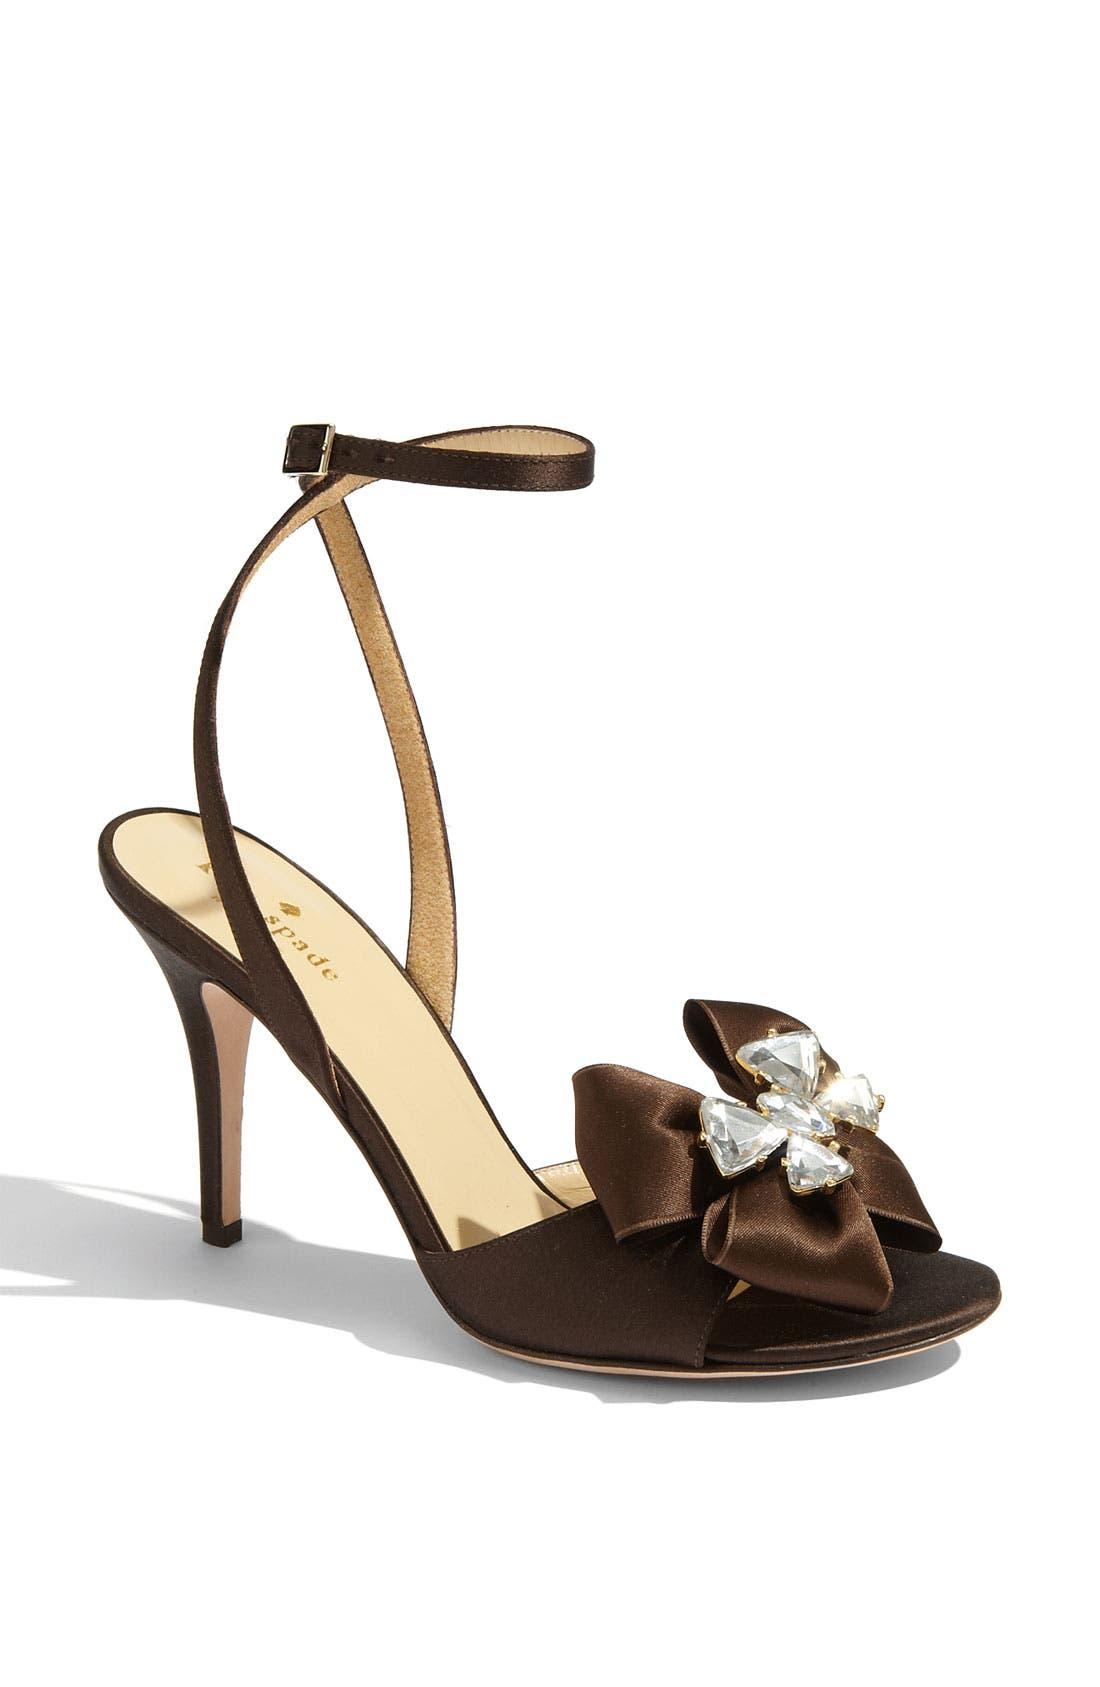 Main Image - kate spade new york 'shelby' satin sandal